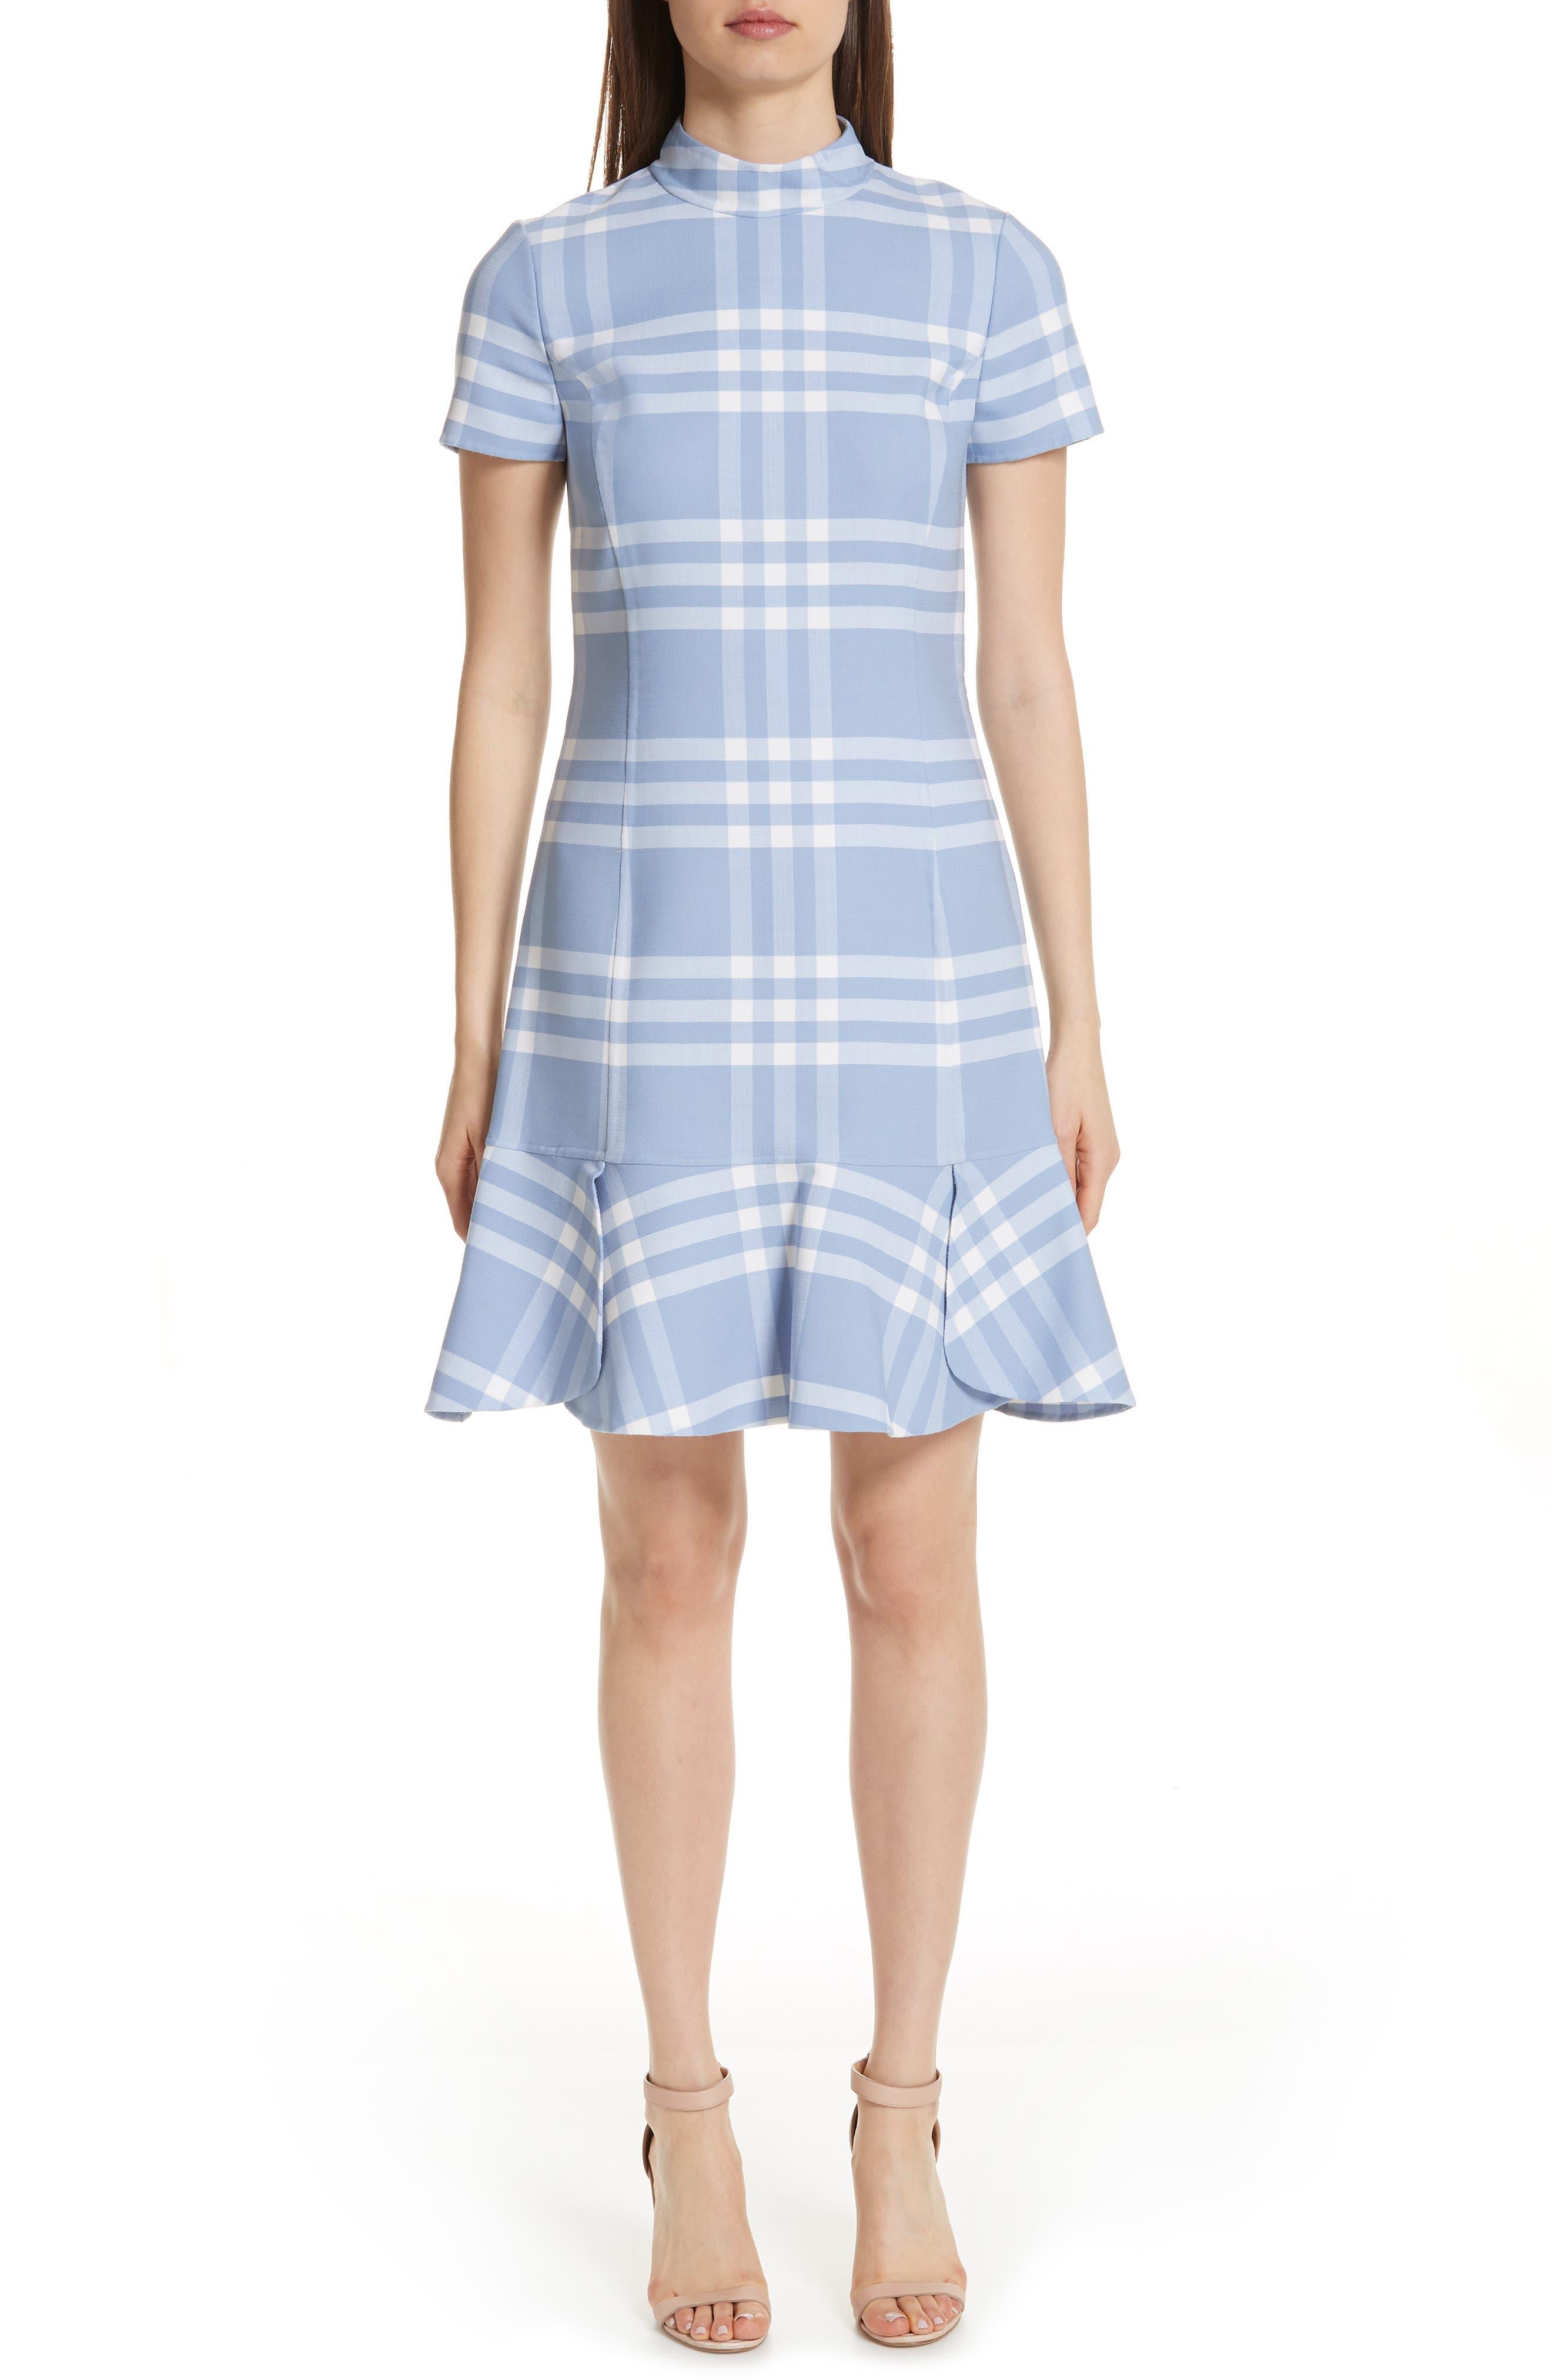 Oscar De La Renta Checkered Ruffle Hem Stretch Wool Dress, Blue